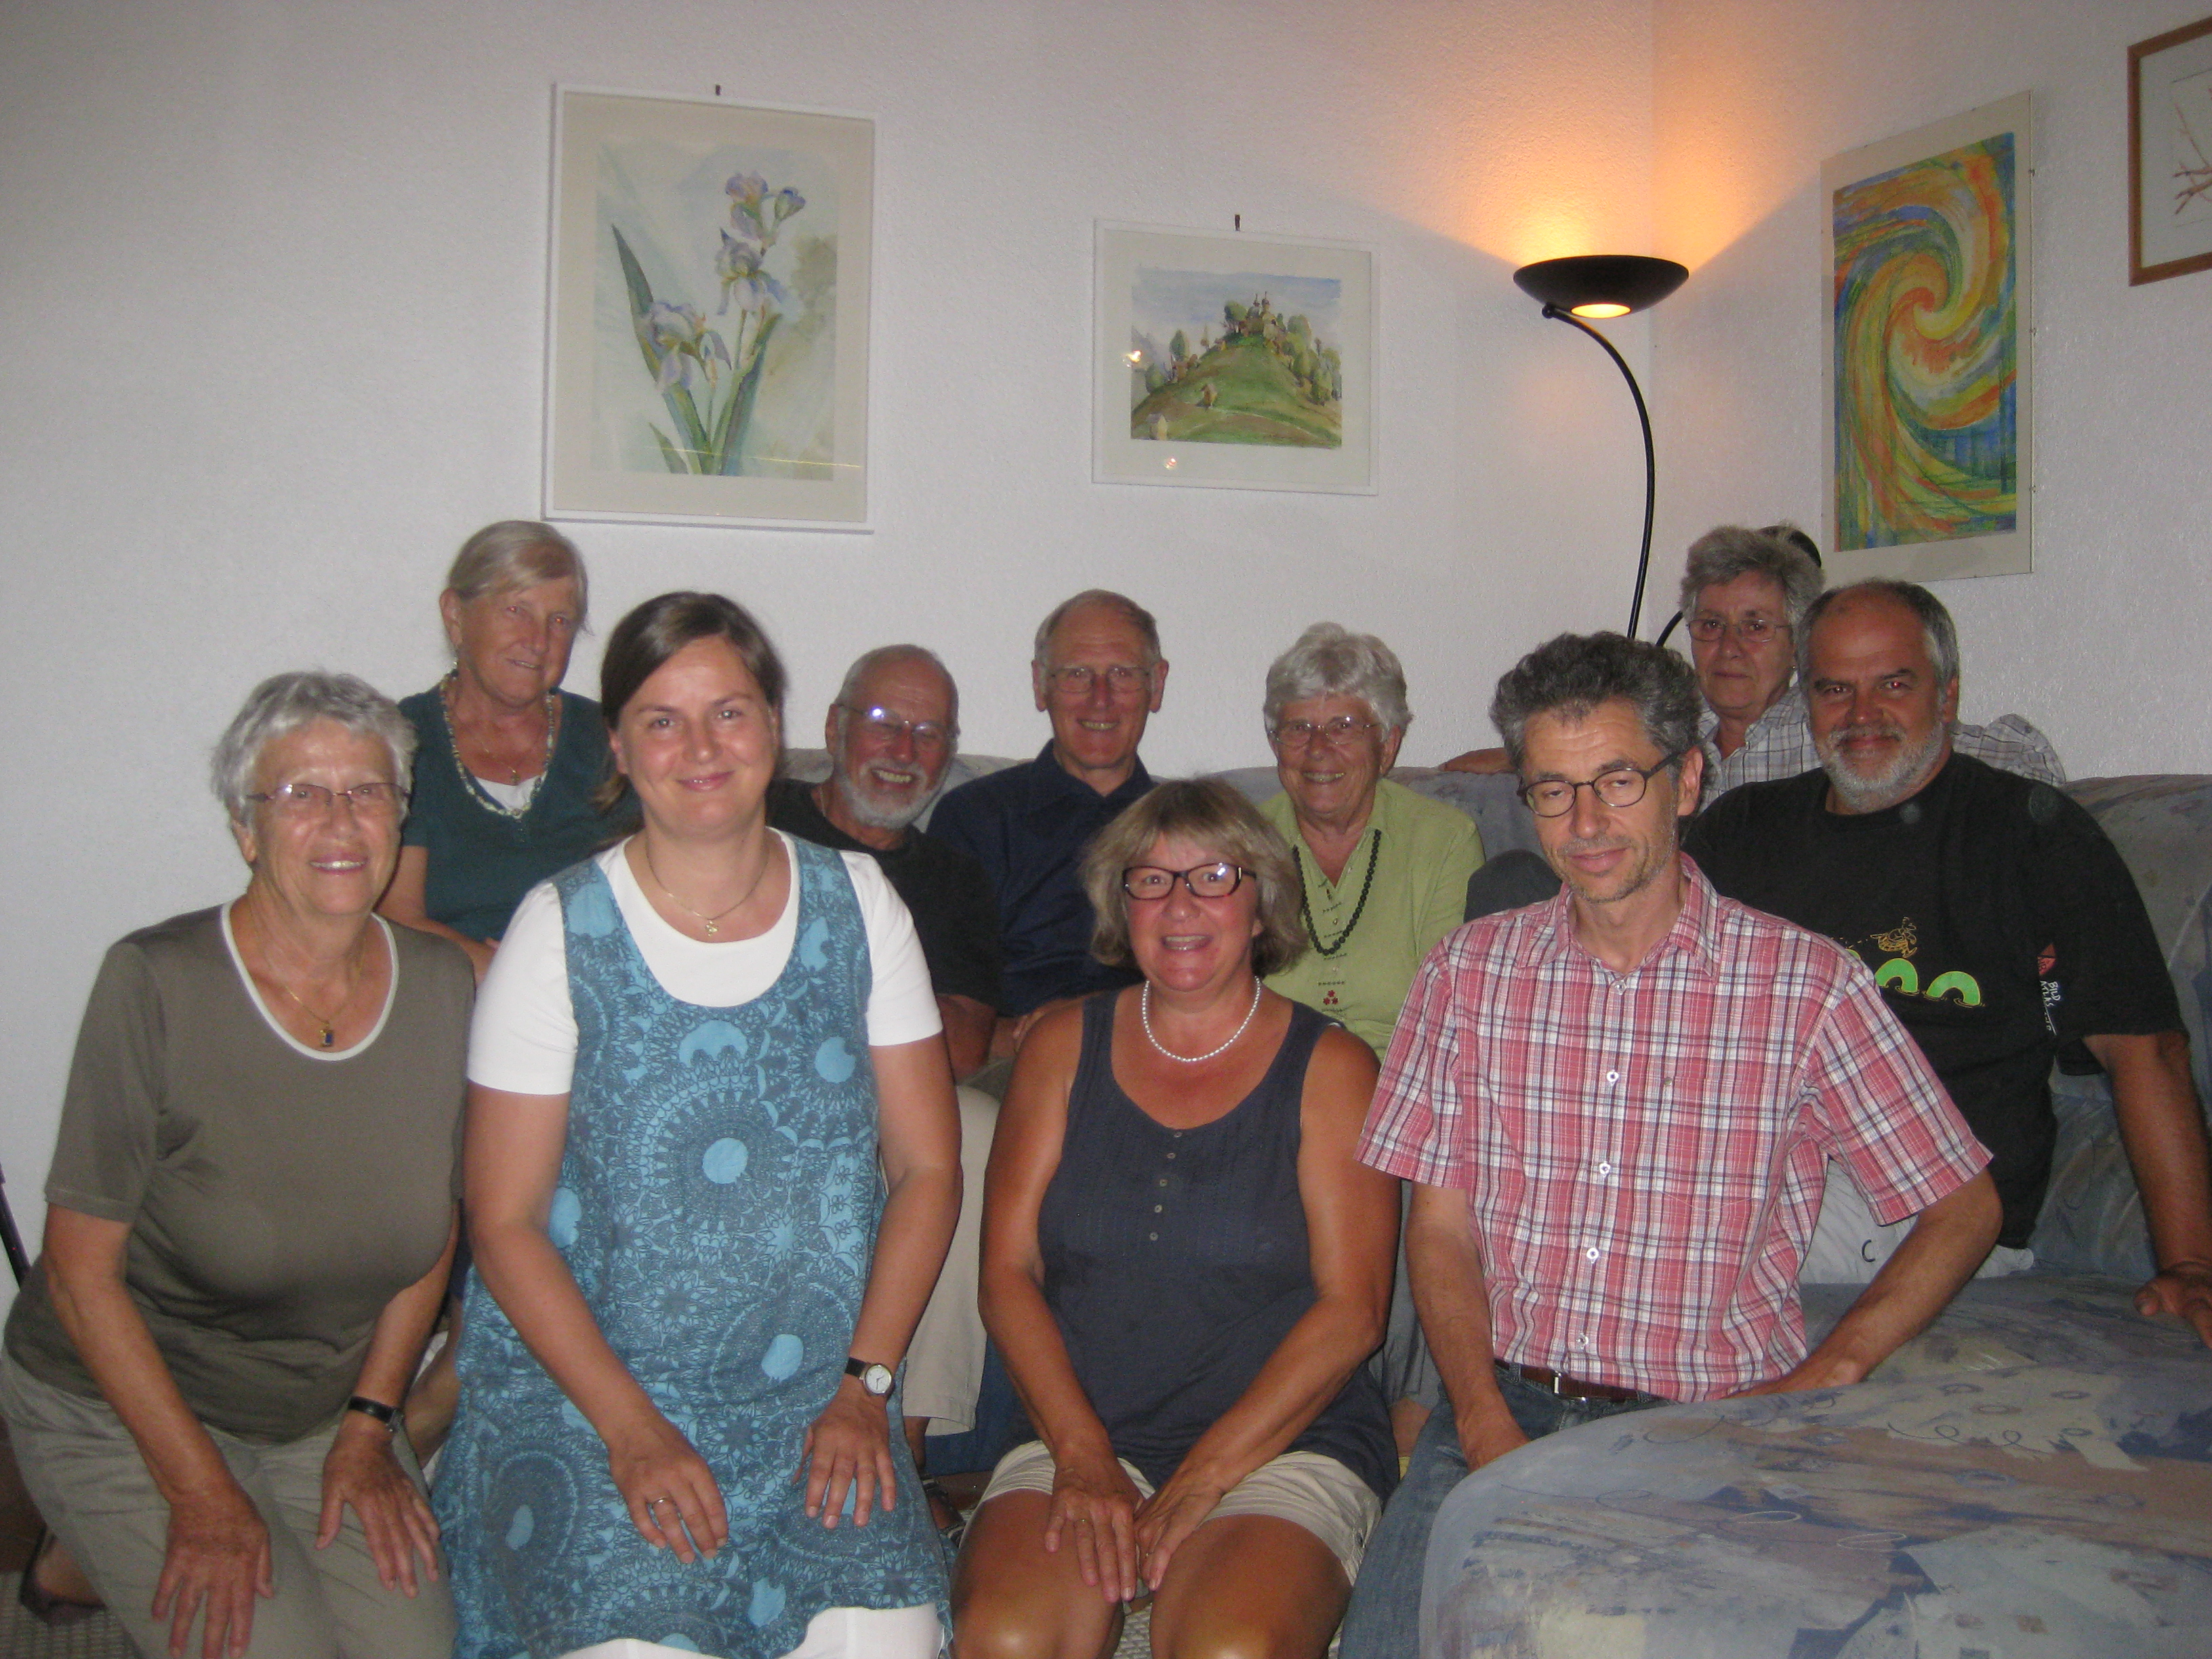 Pax Christi Tirol